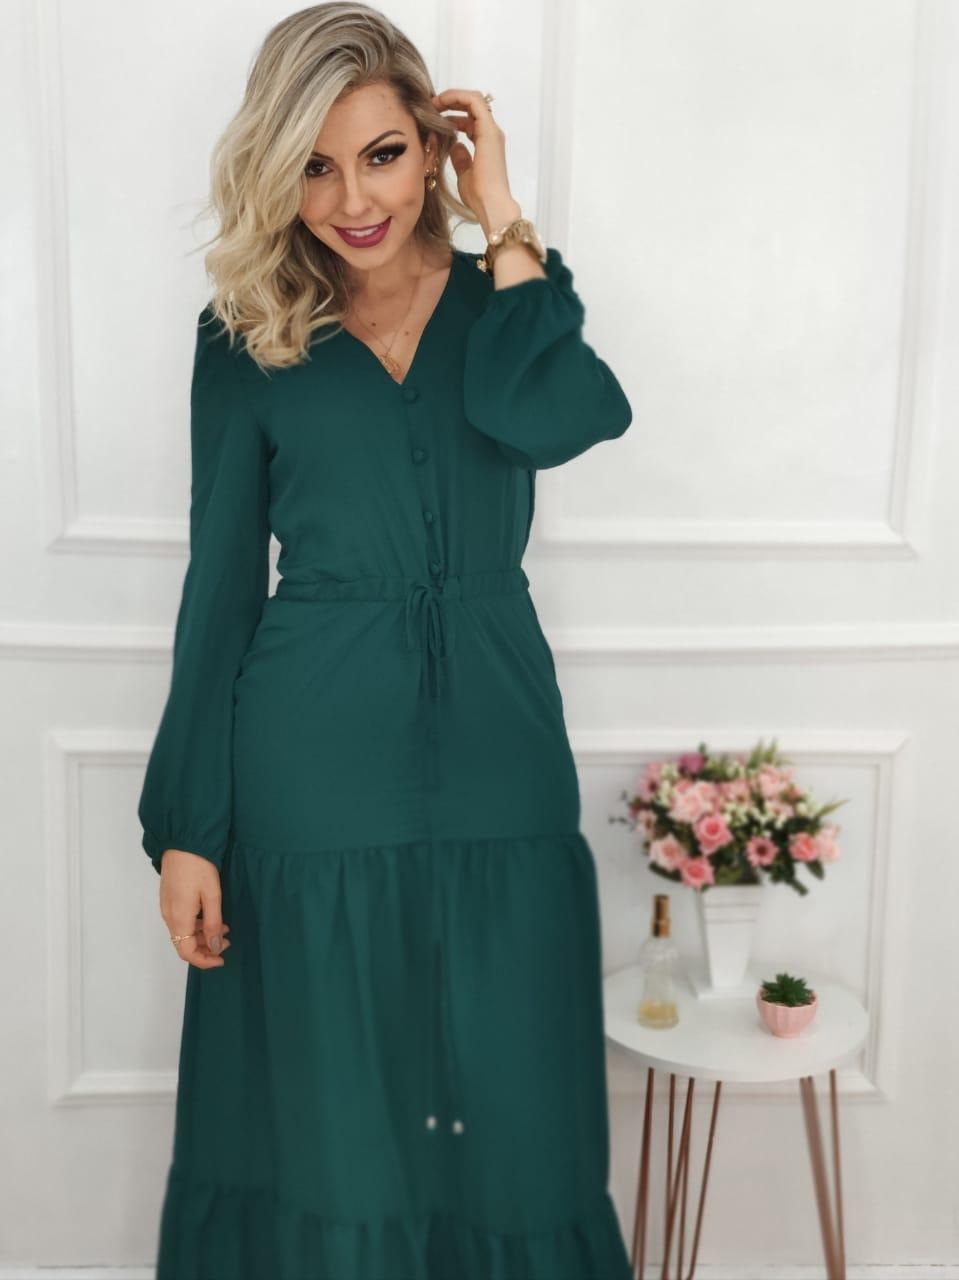 Vestido Longo Manga Longa Verde